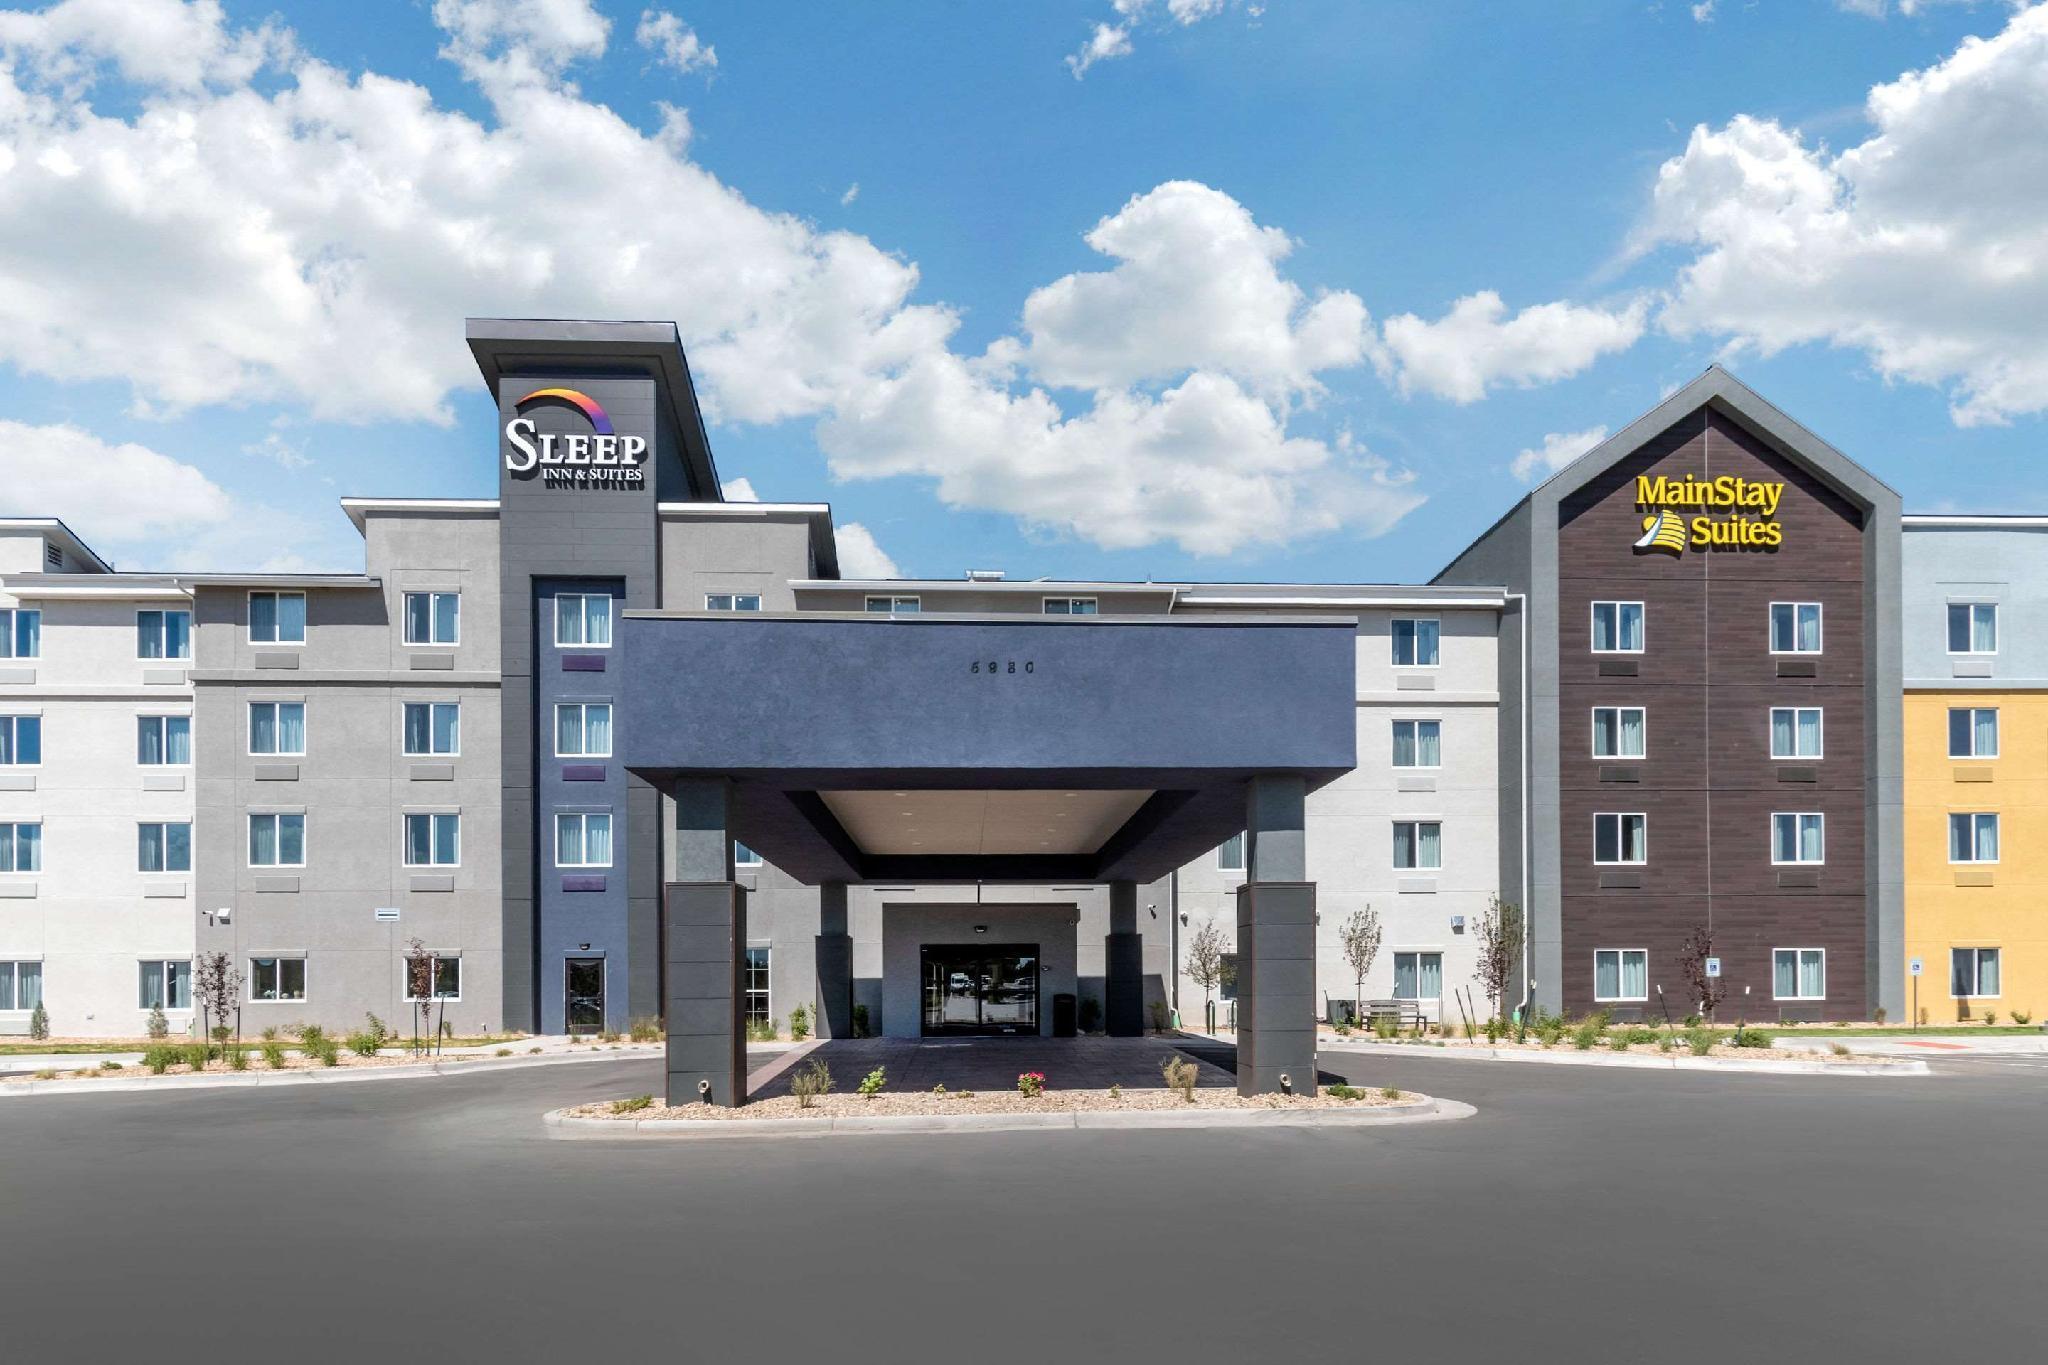 Sleep Inn And Suites Denver International Airport